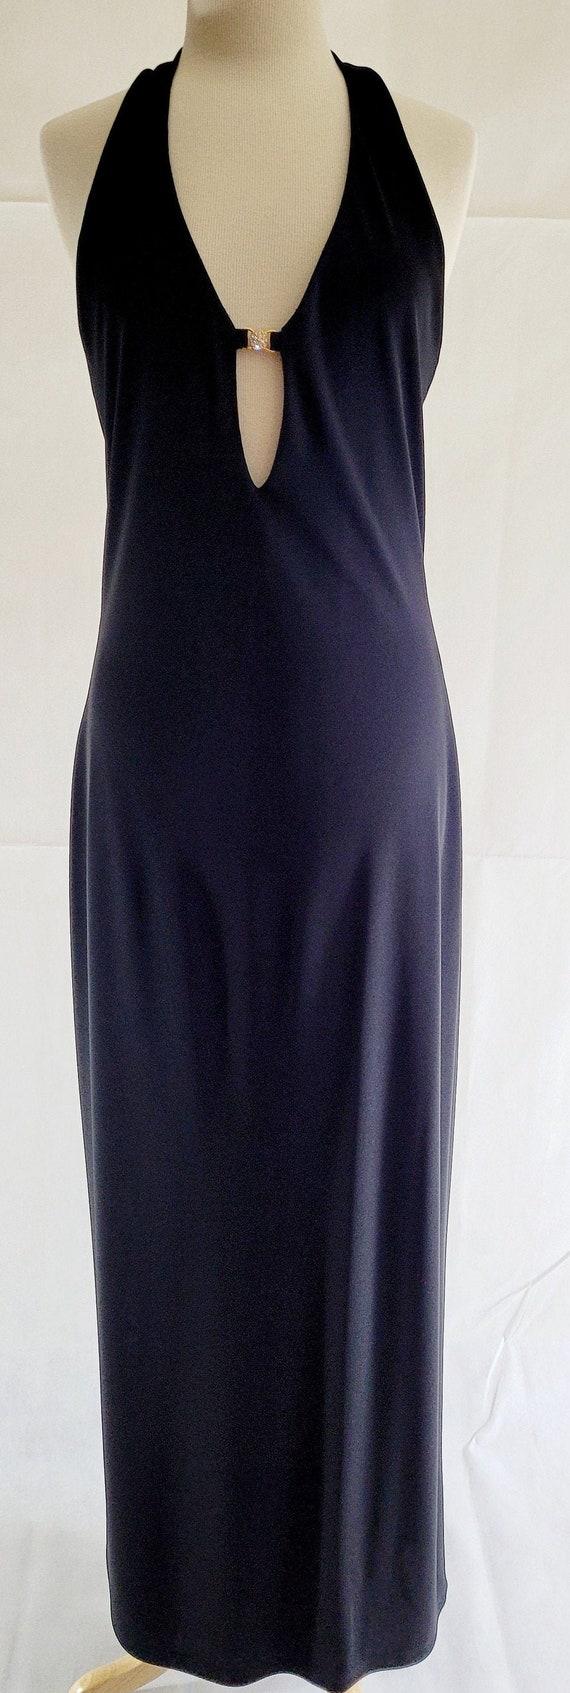 Black Market dress